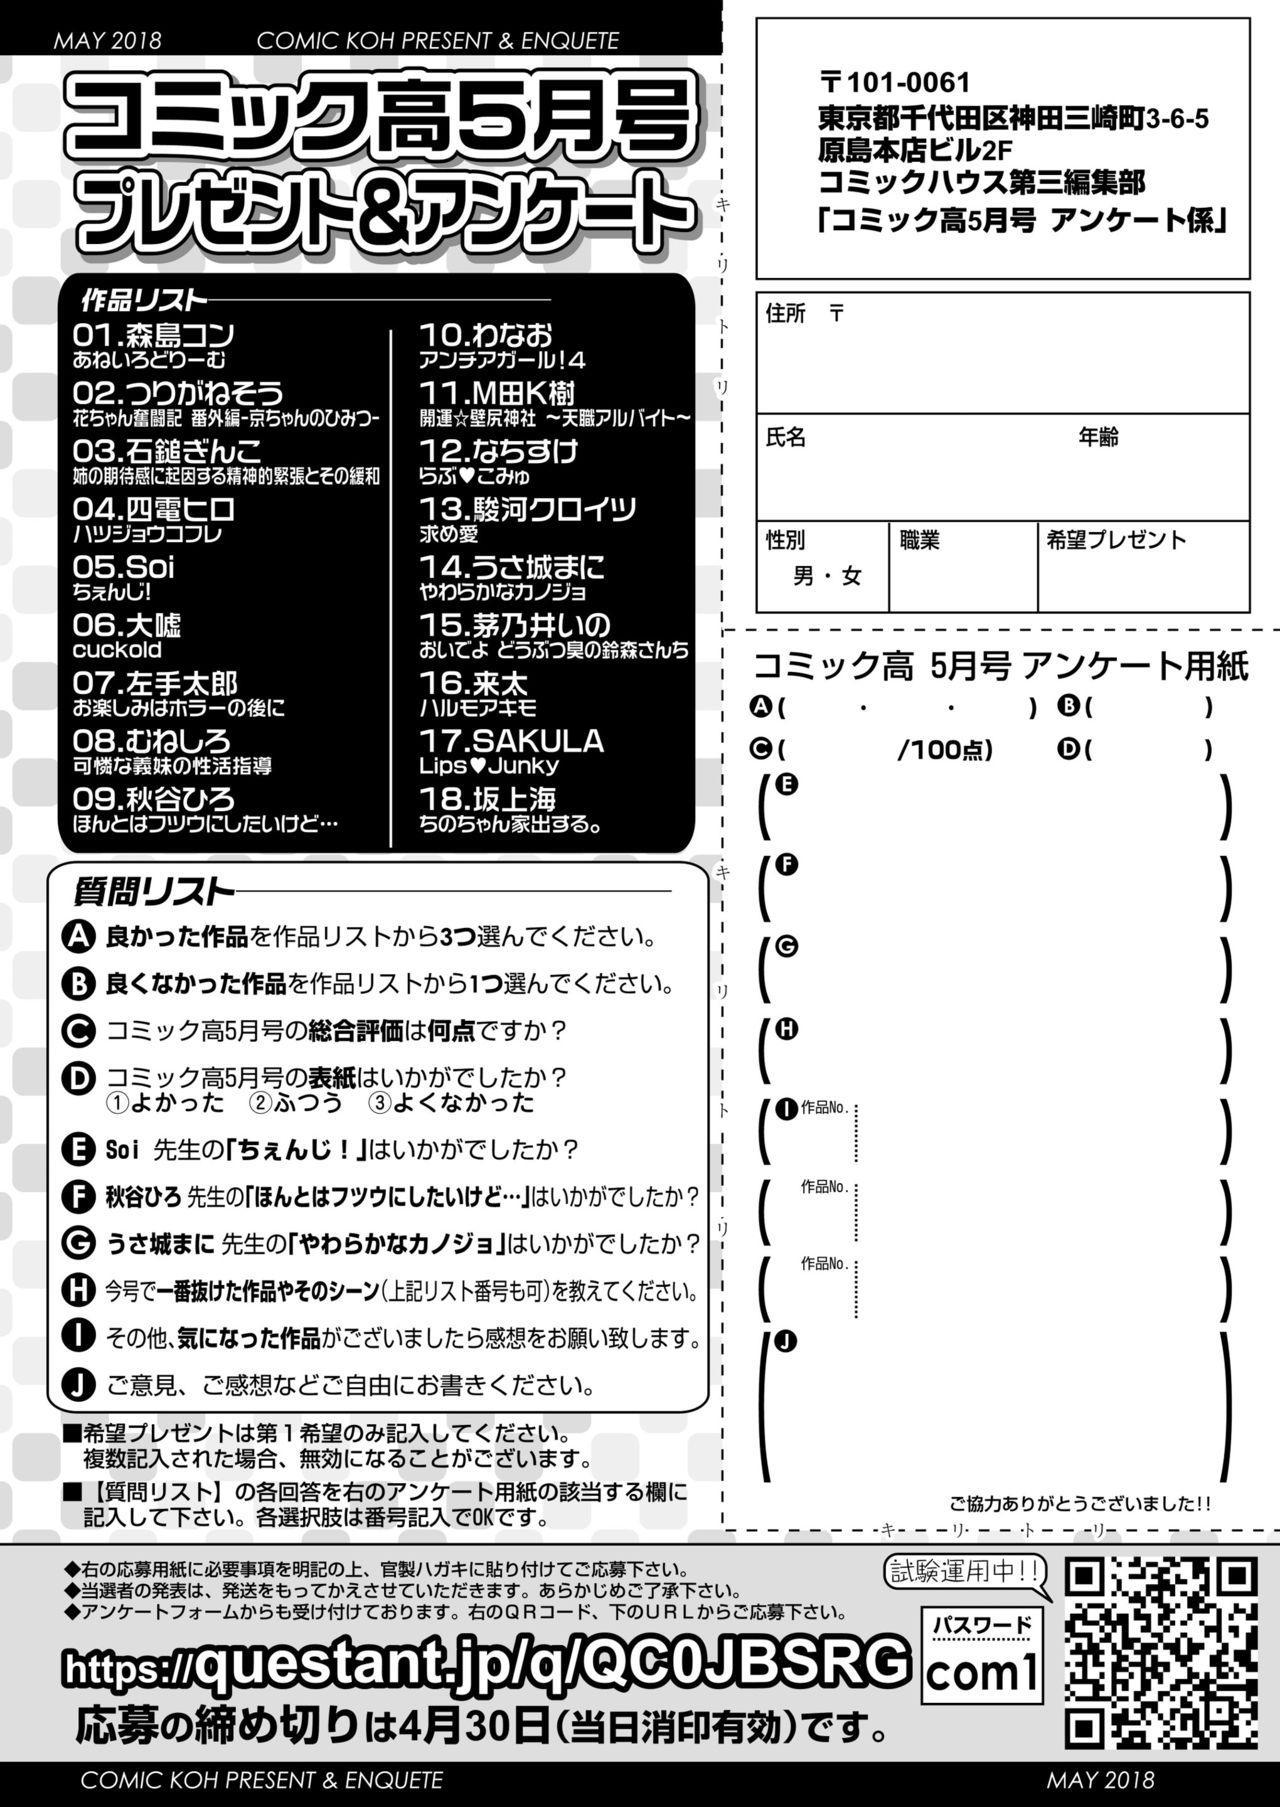 COMIC Koh 2018-05 381